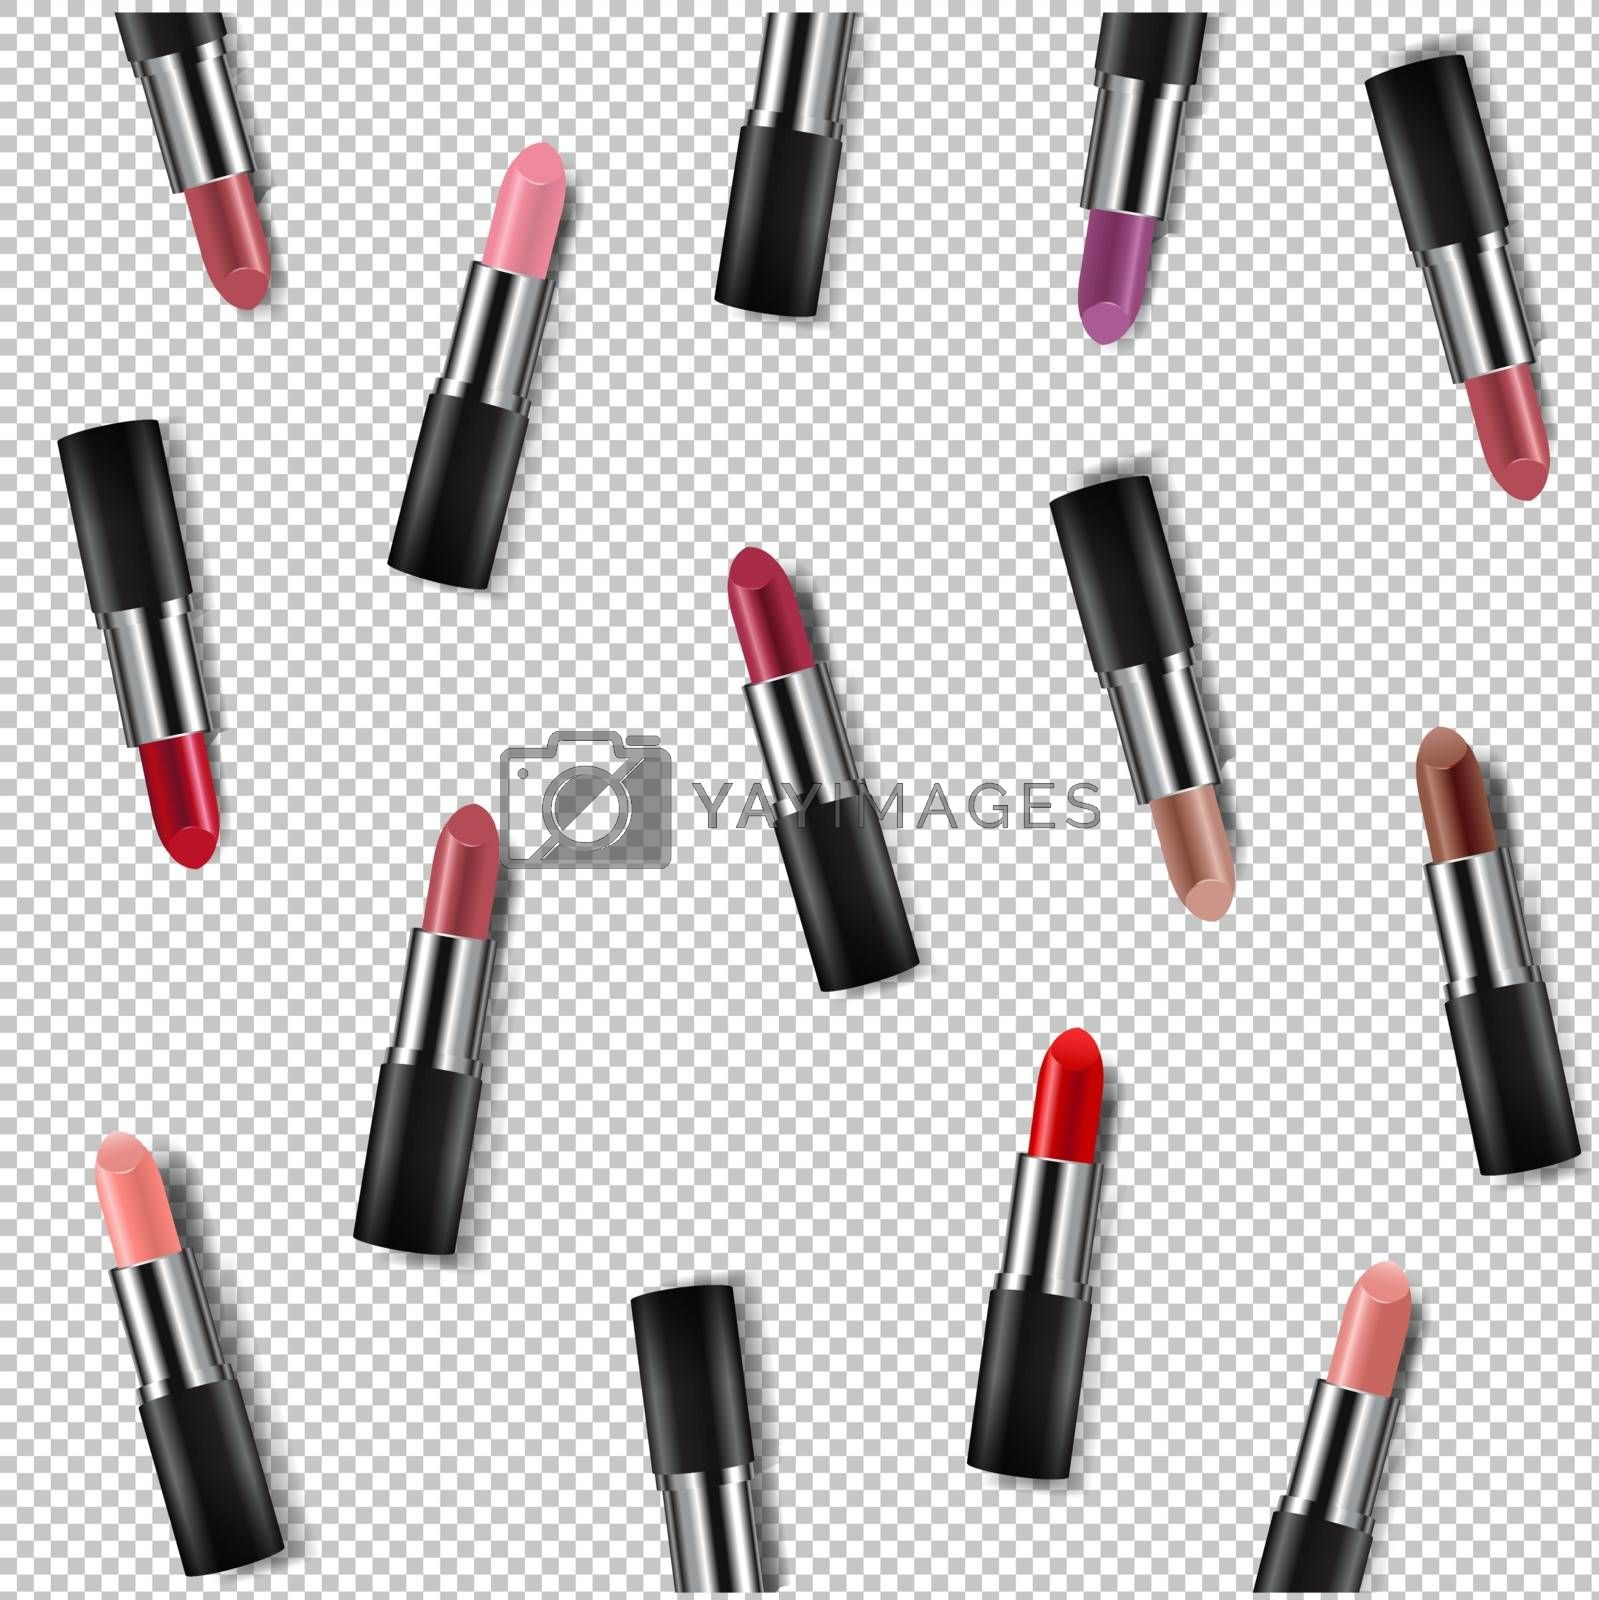 Color Lipsticks Poster Transparent Background by adamson